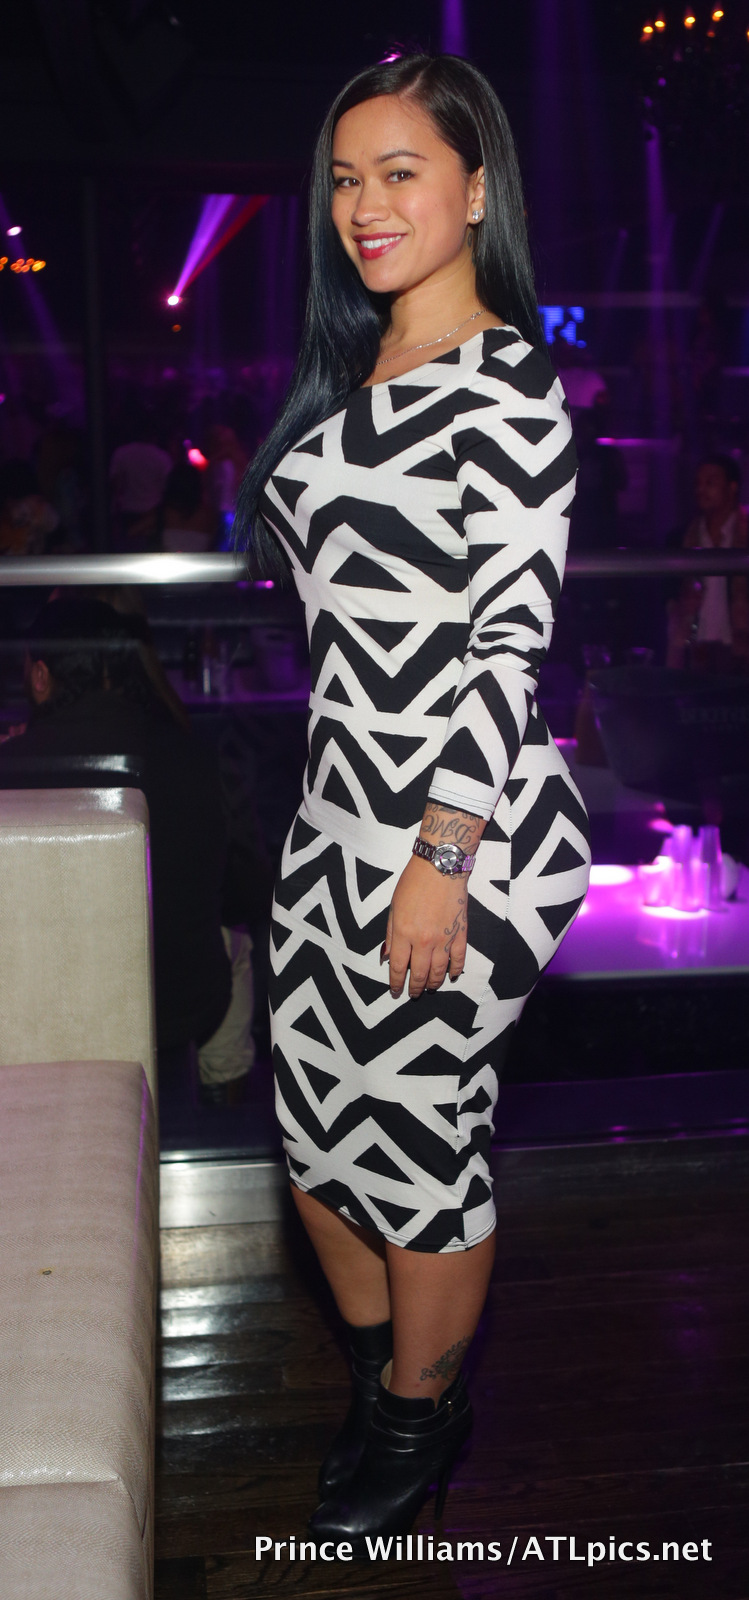 Zoey deutch women in film max mara face of the future awards in la nude (82 photos), Feet Celebrites pictures